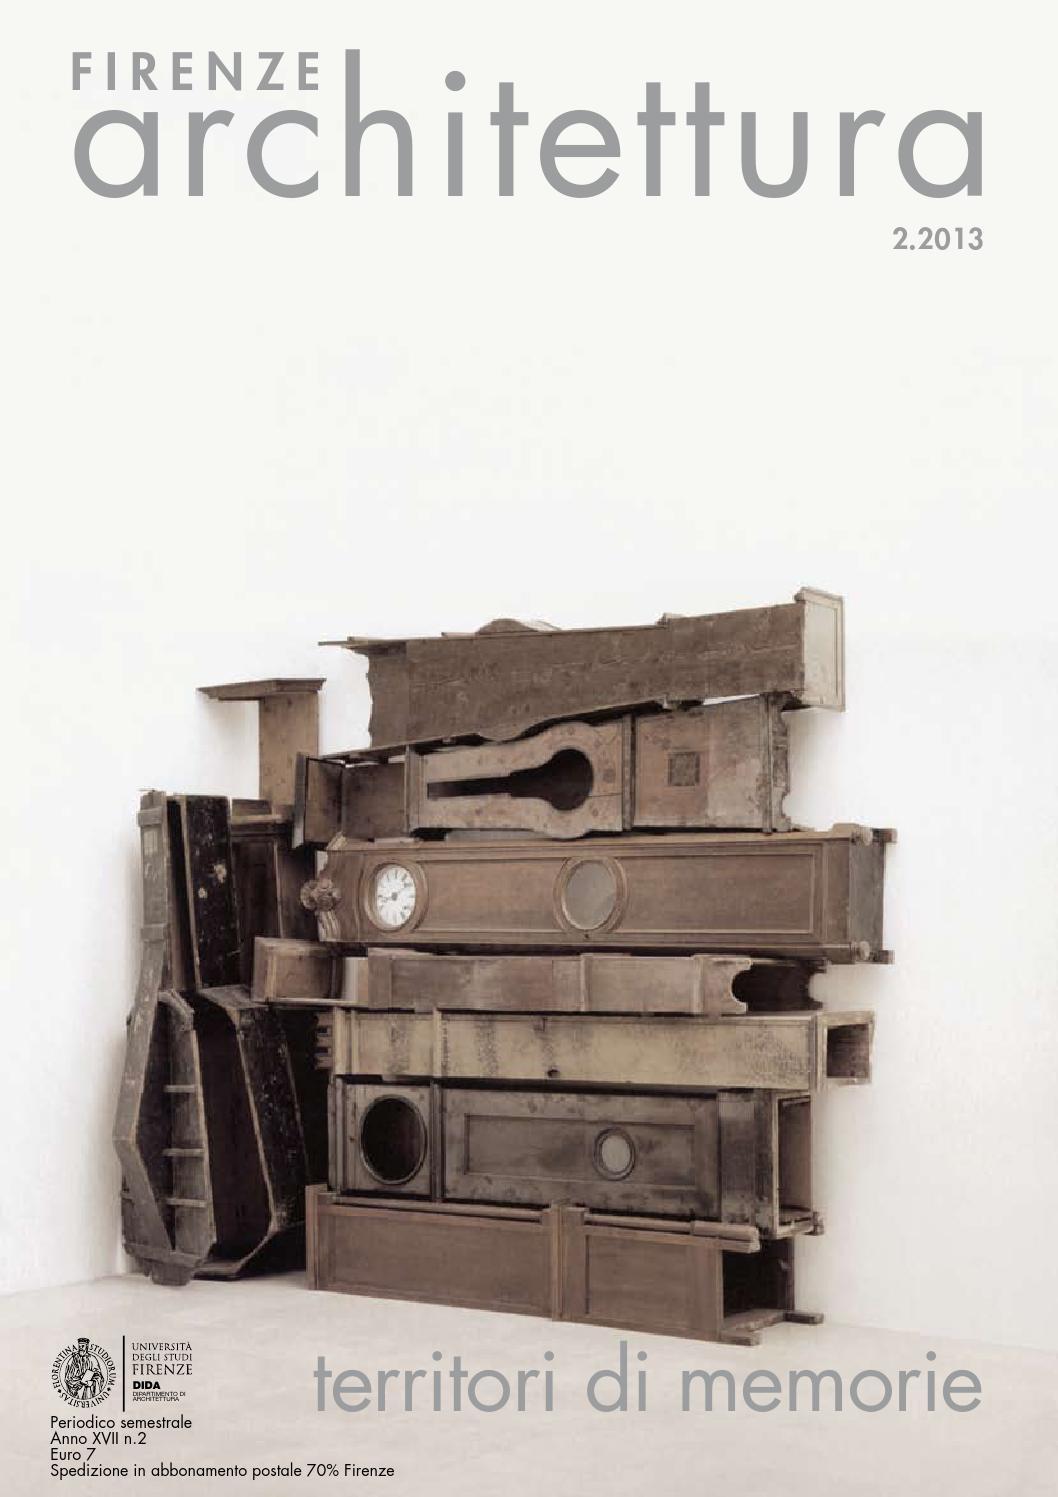 Firenze Architettura 2013-2 by DIDA - issuu